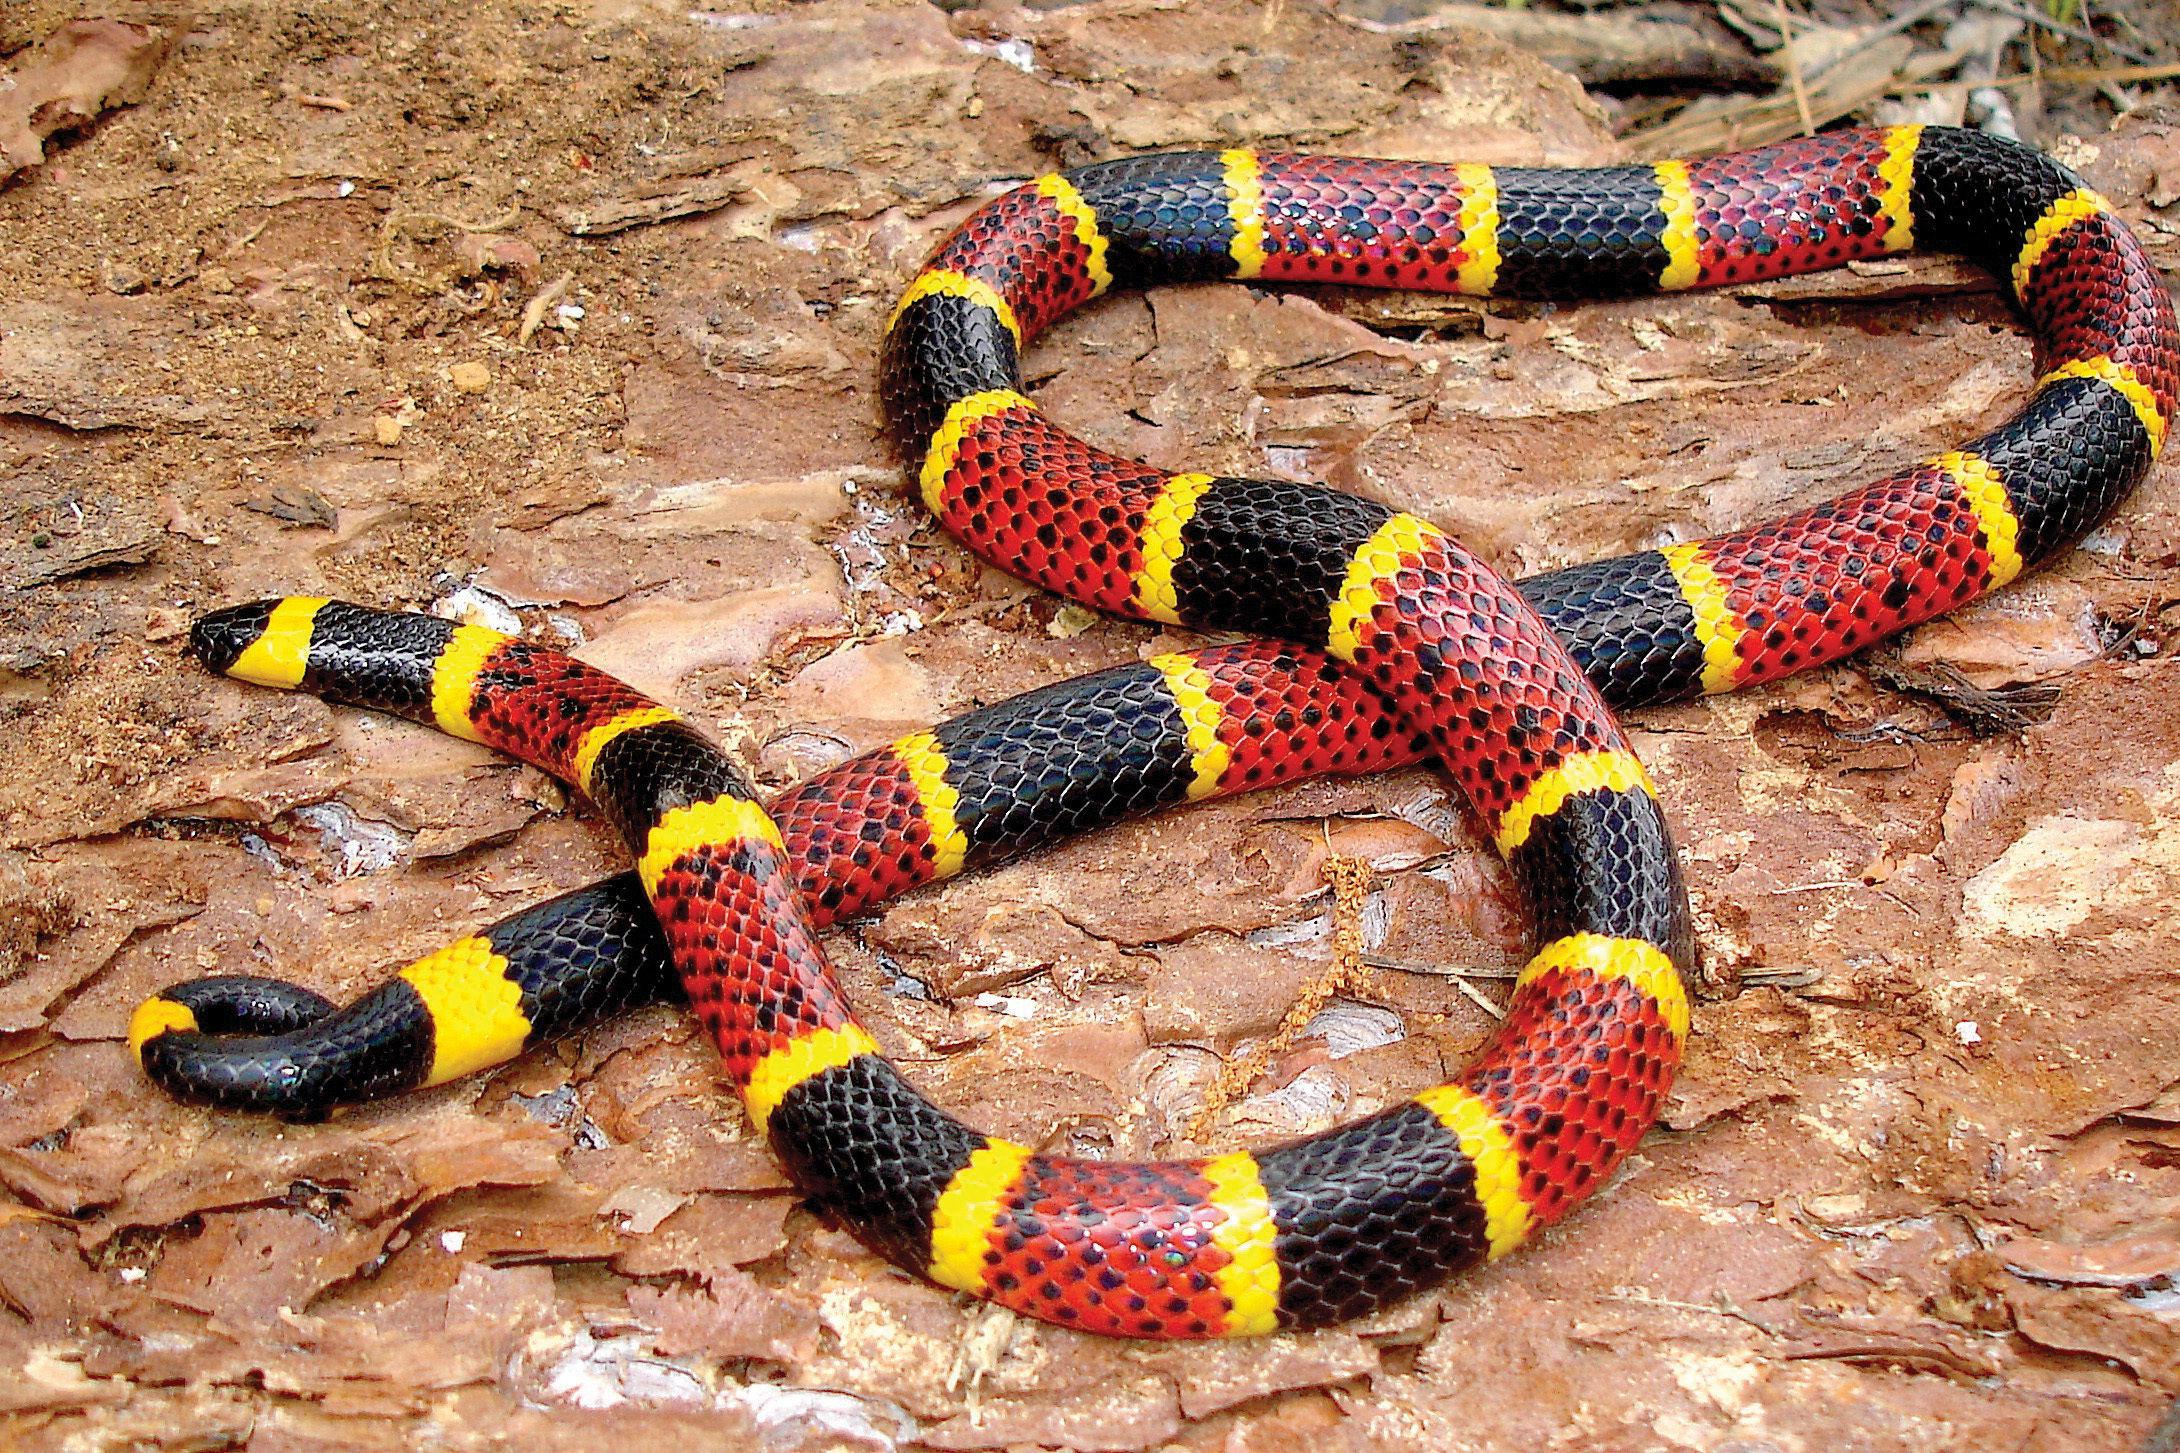 0517 coral snake phgioq